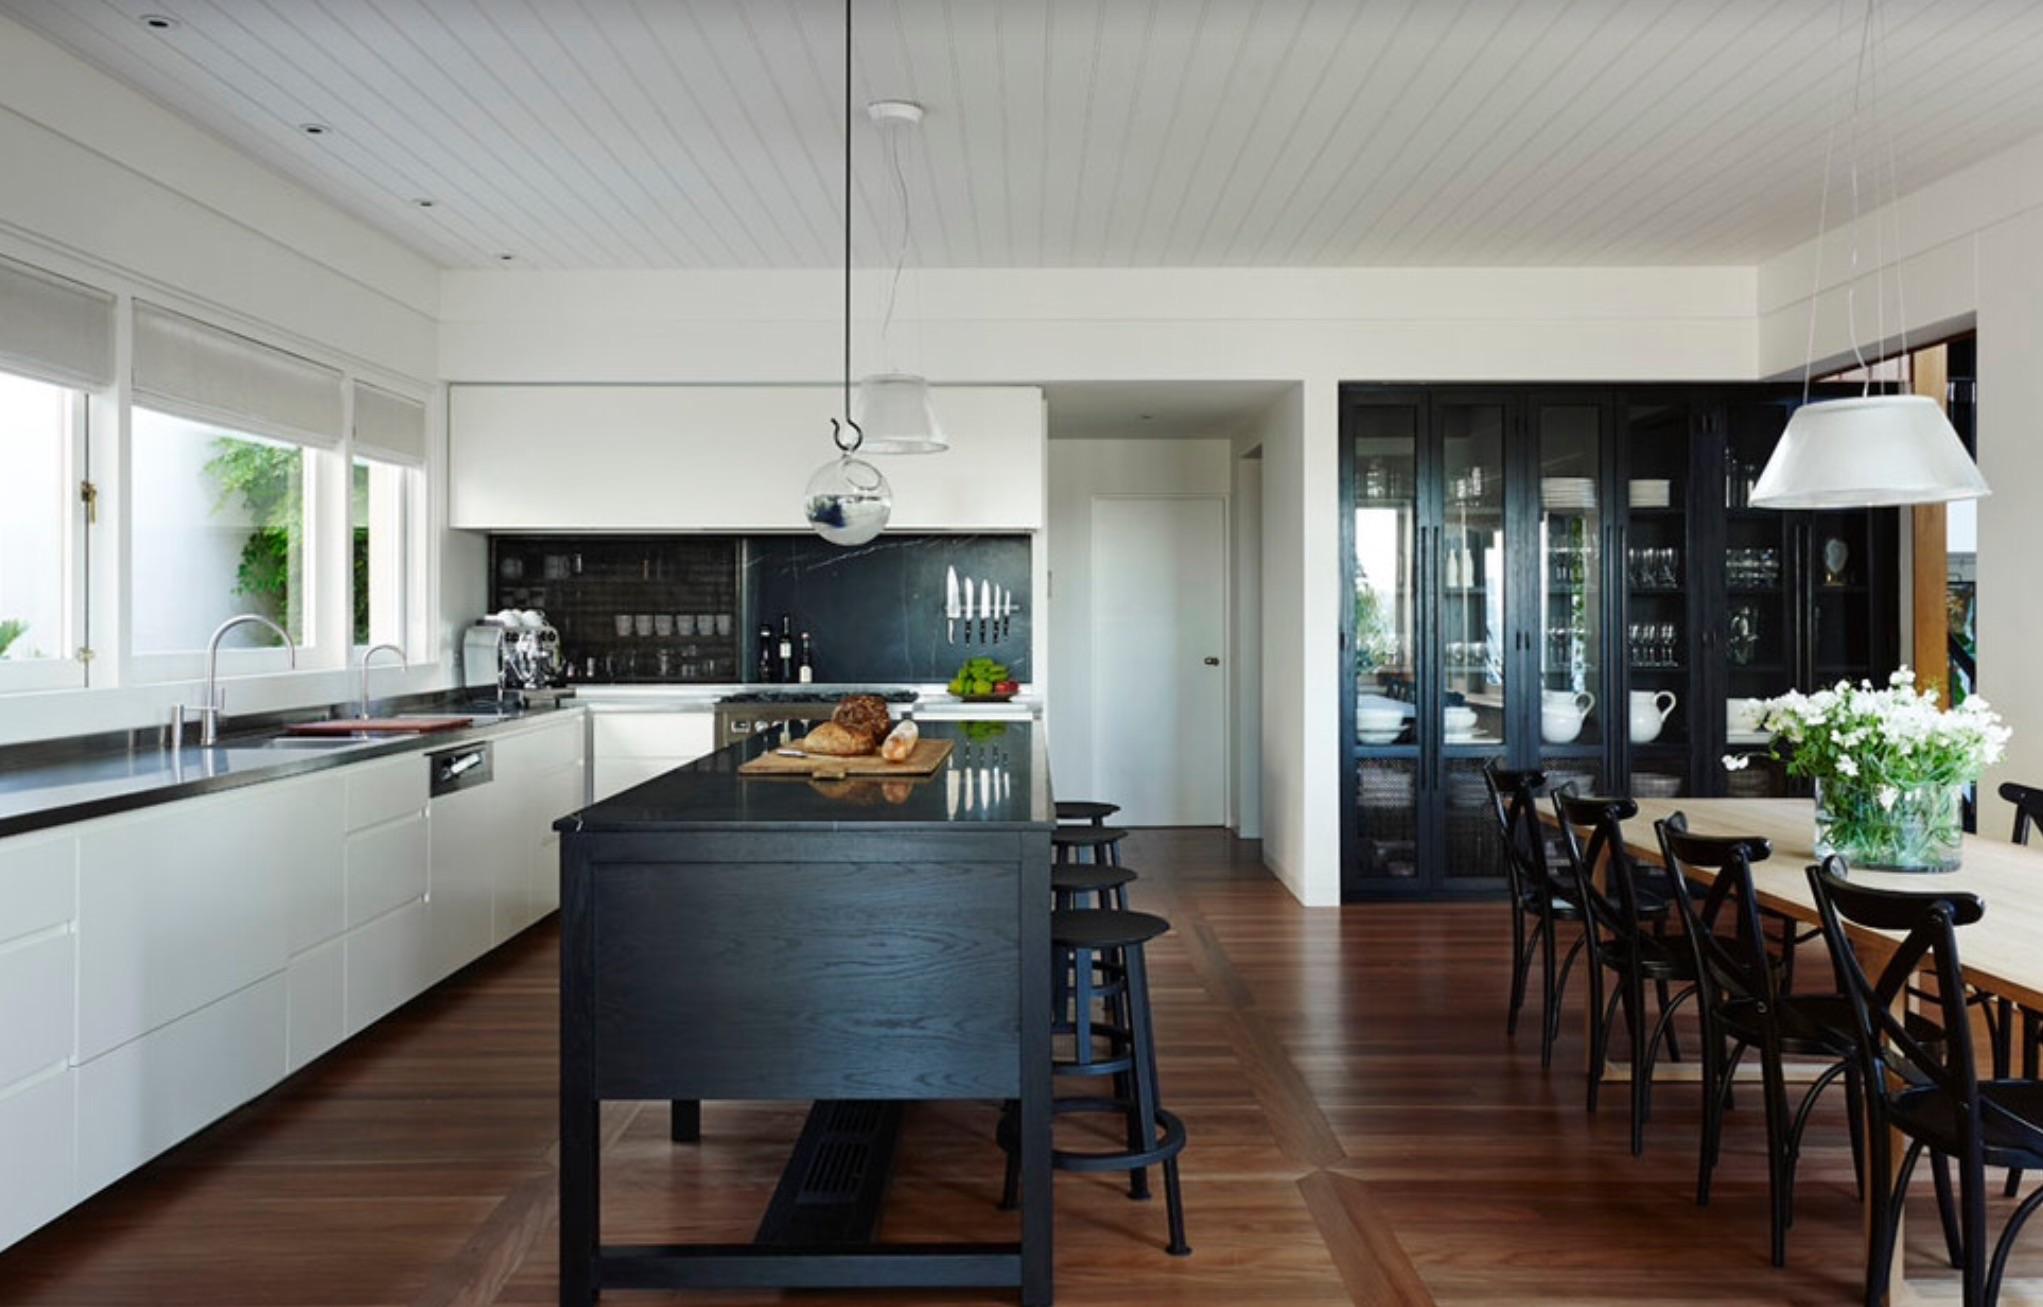 Black island and built-in china cabinet: Design by Sarah Davison Interior Design